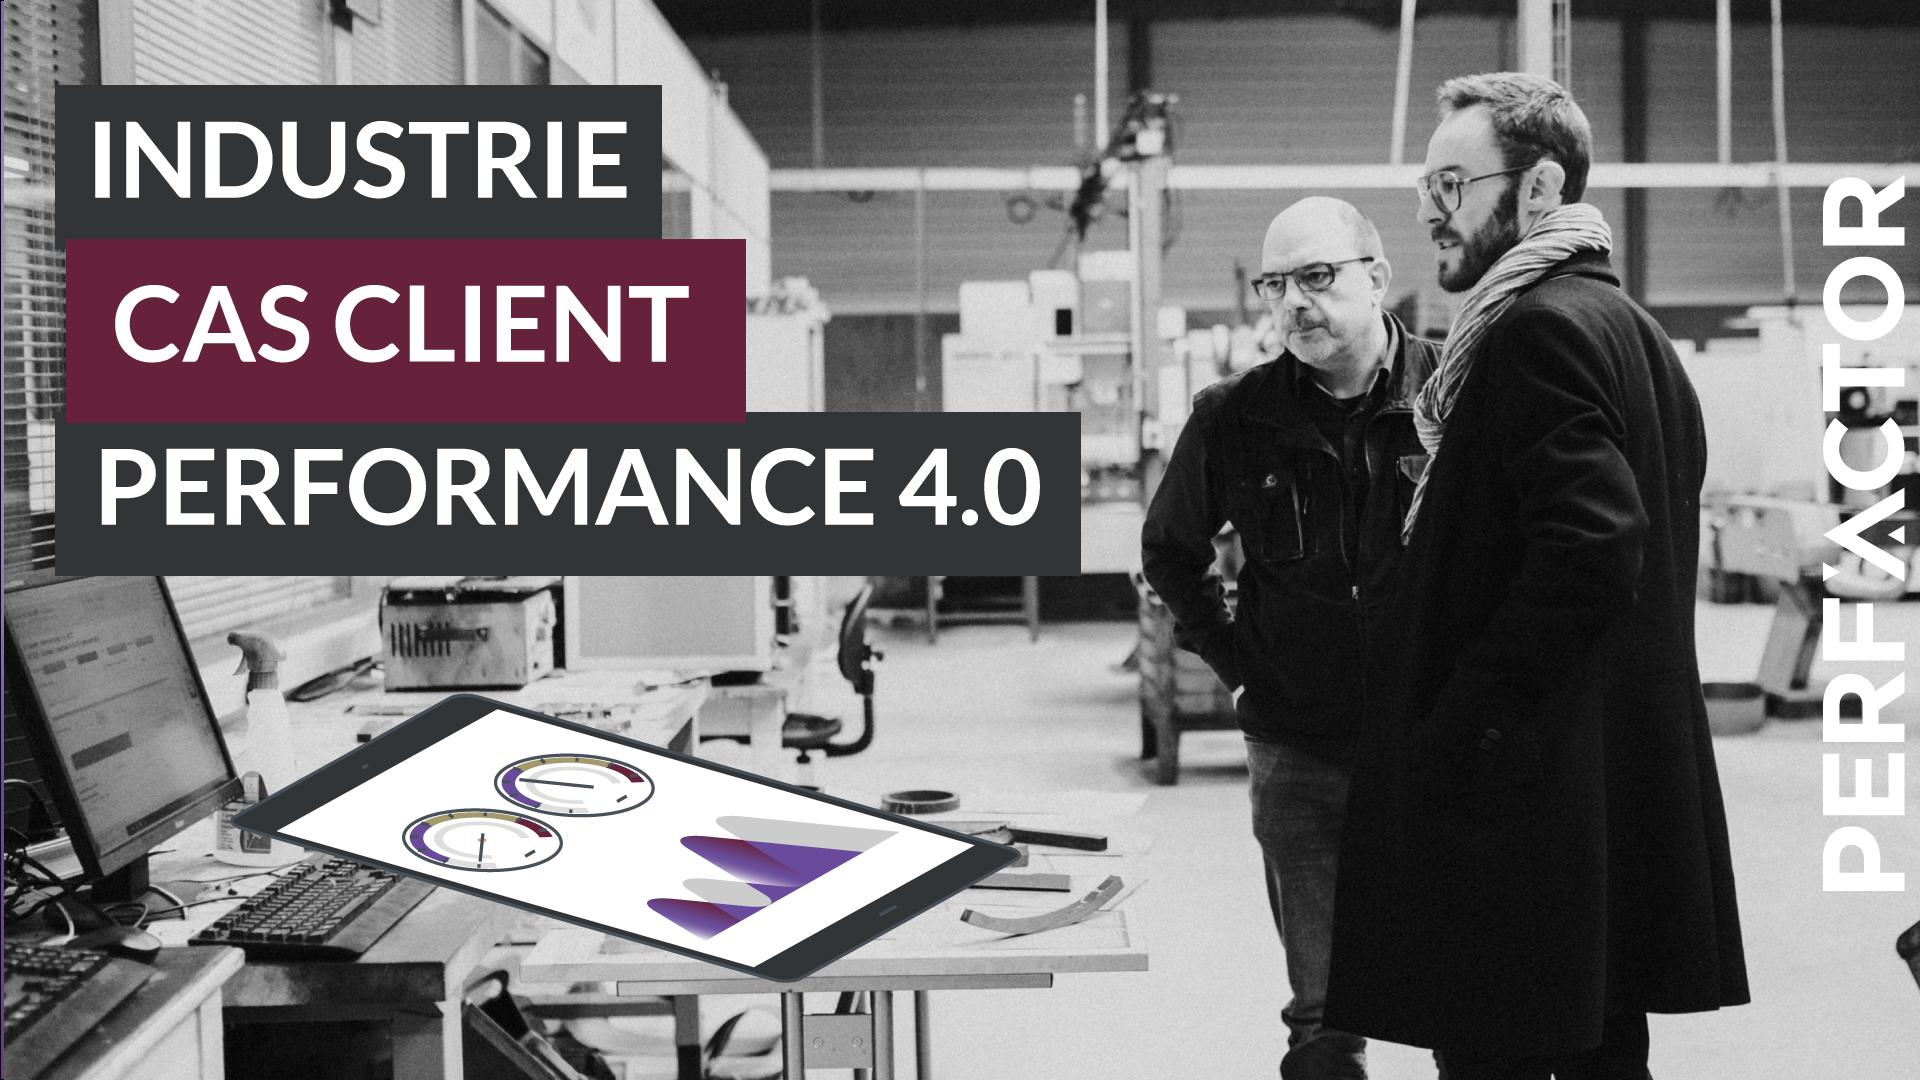 Cas client industrie performance industrie 4.0 data management et analytics